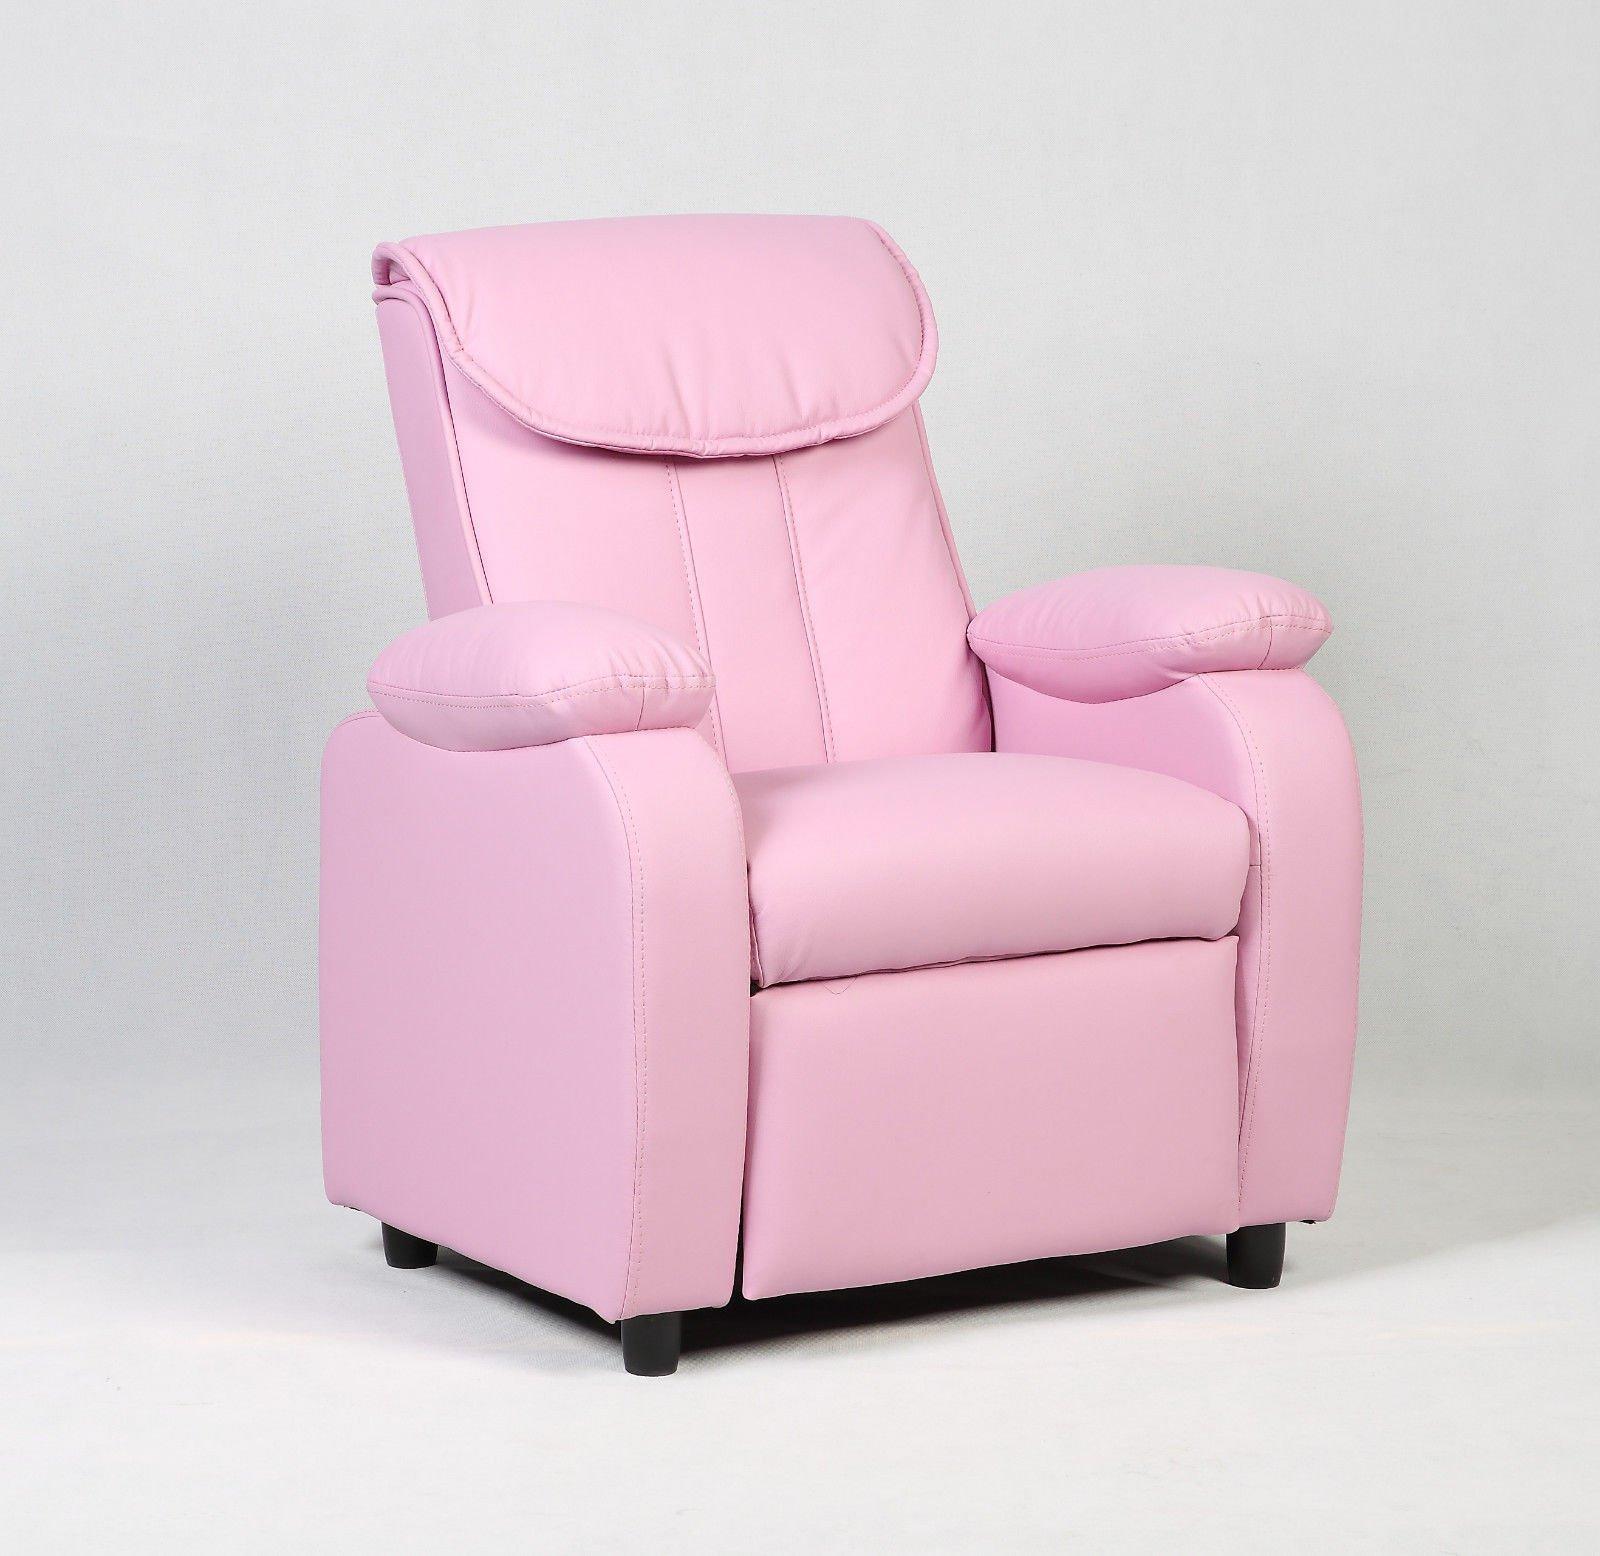 Costzon Deluxe Children Recliner Sofa Armrest Chair Living Room Bedroom Couch Home Furniture (Pink)